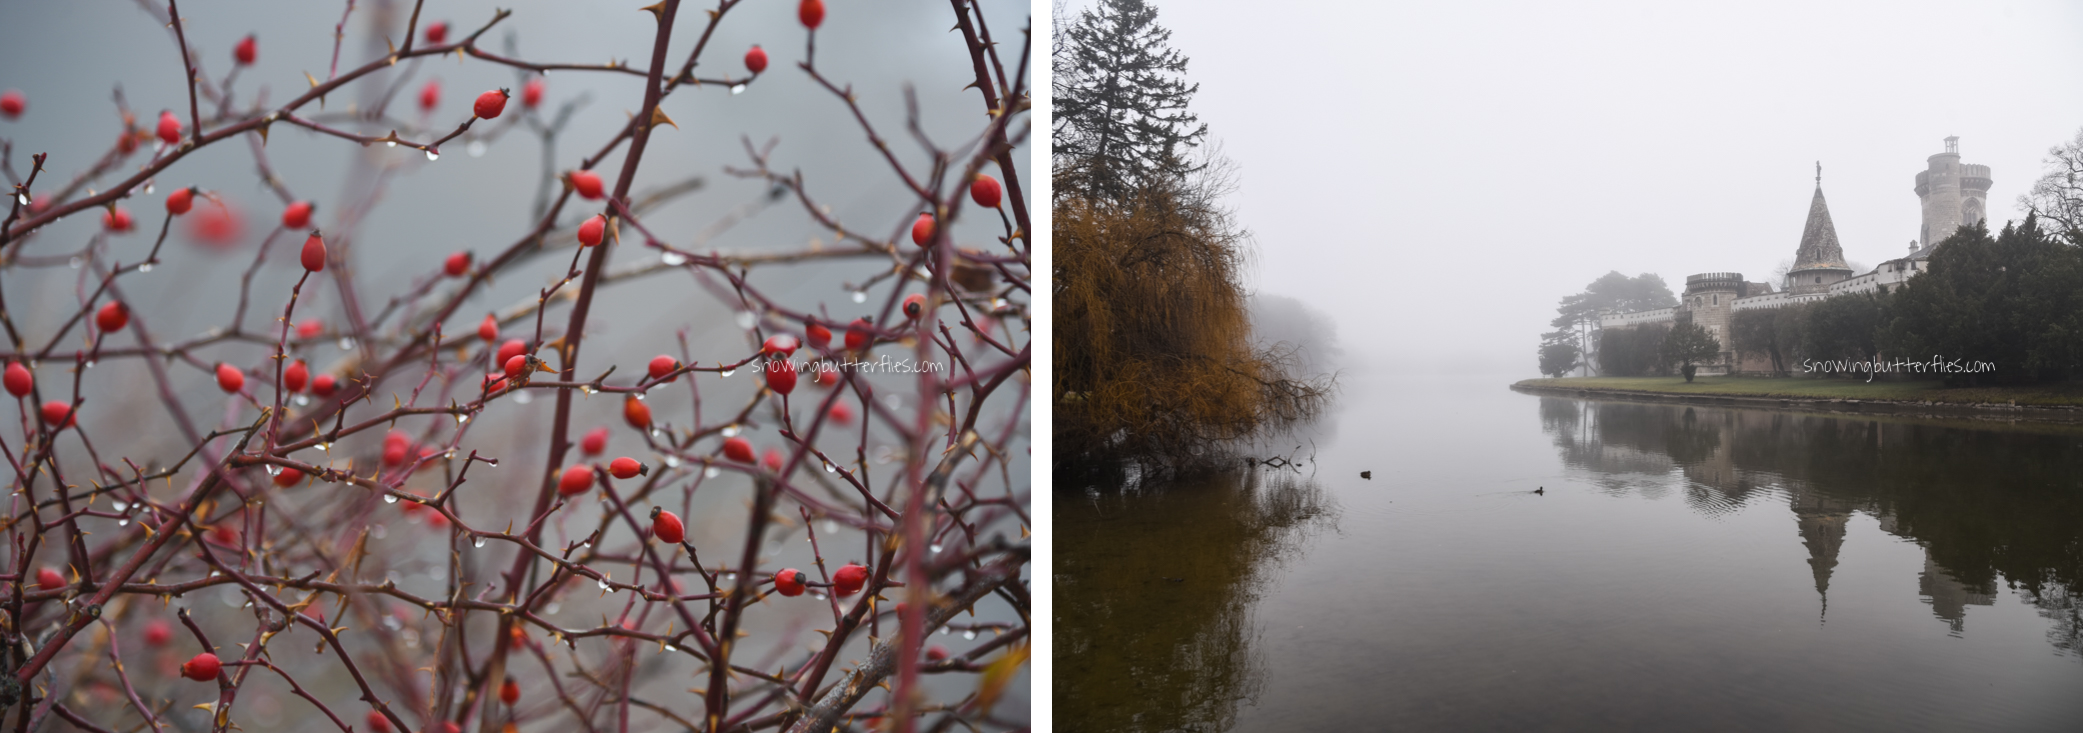 mariana perrone, austria, snowing butterflies, still life, landscape, seasons, laxenburg